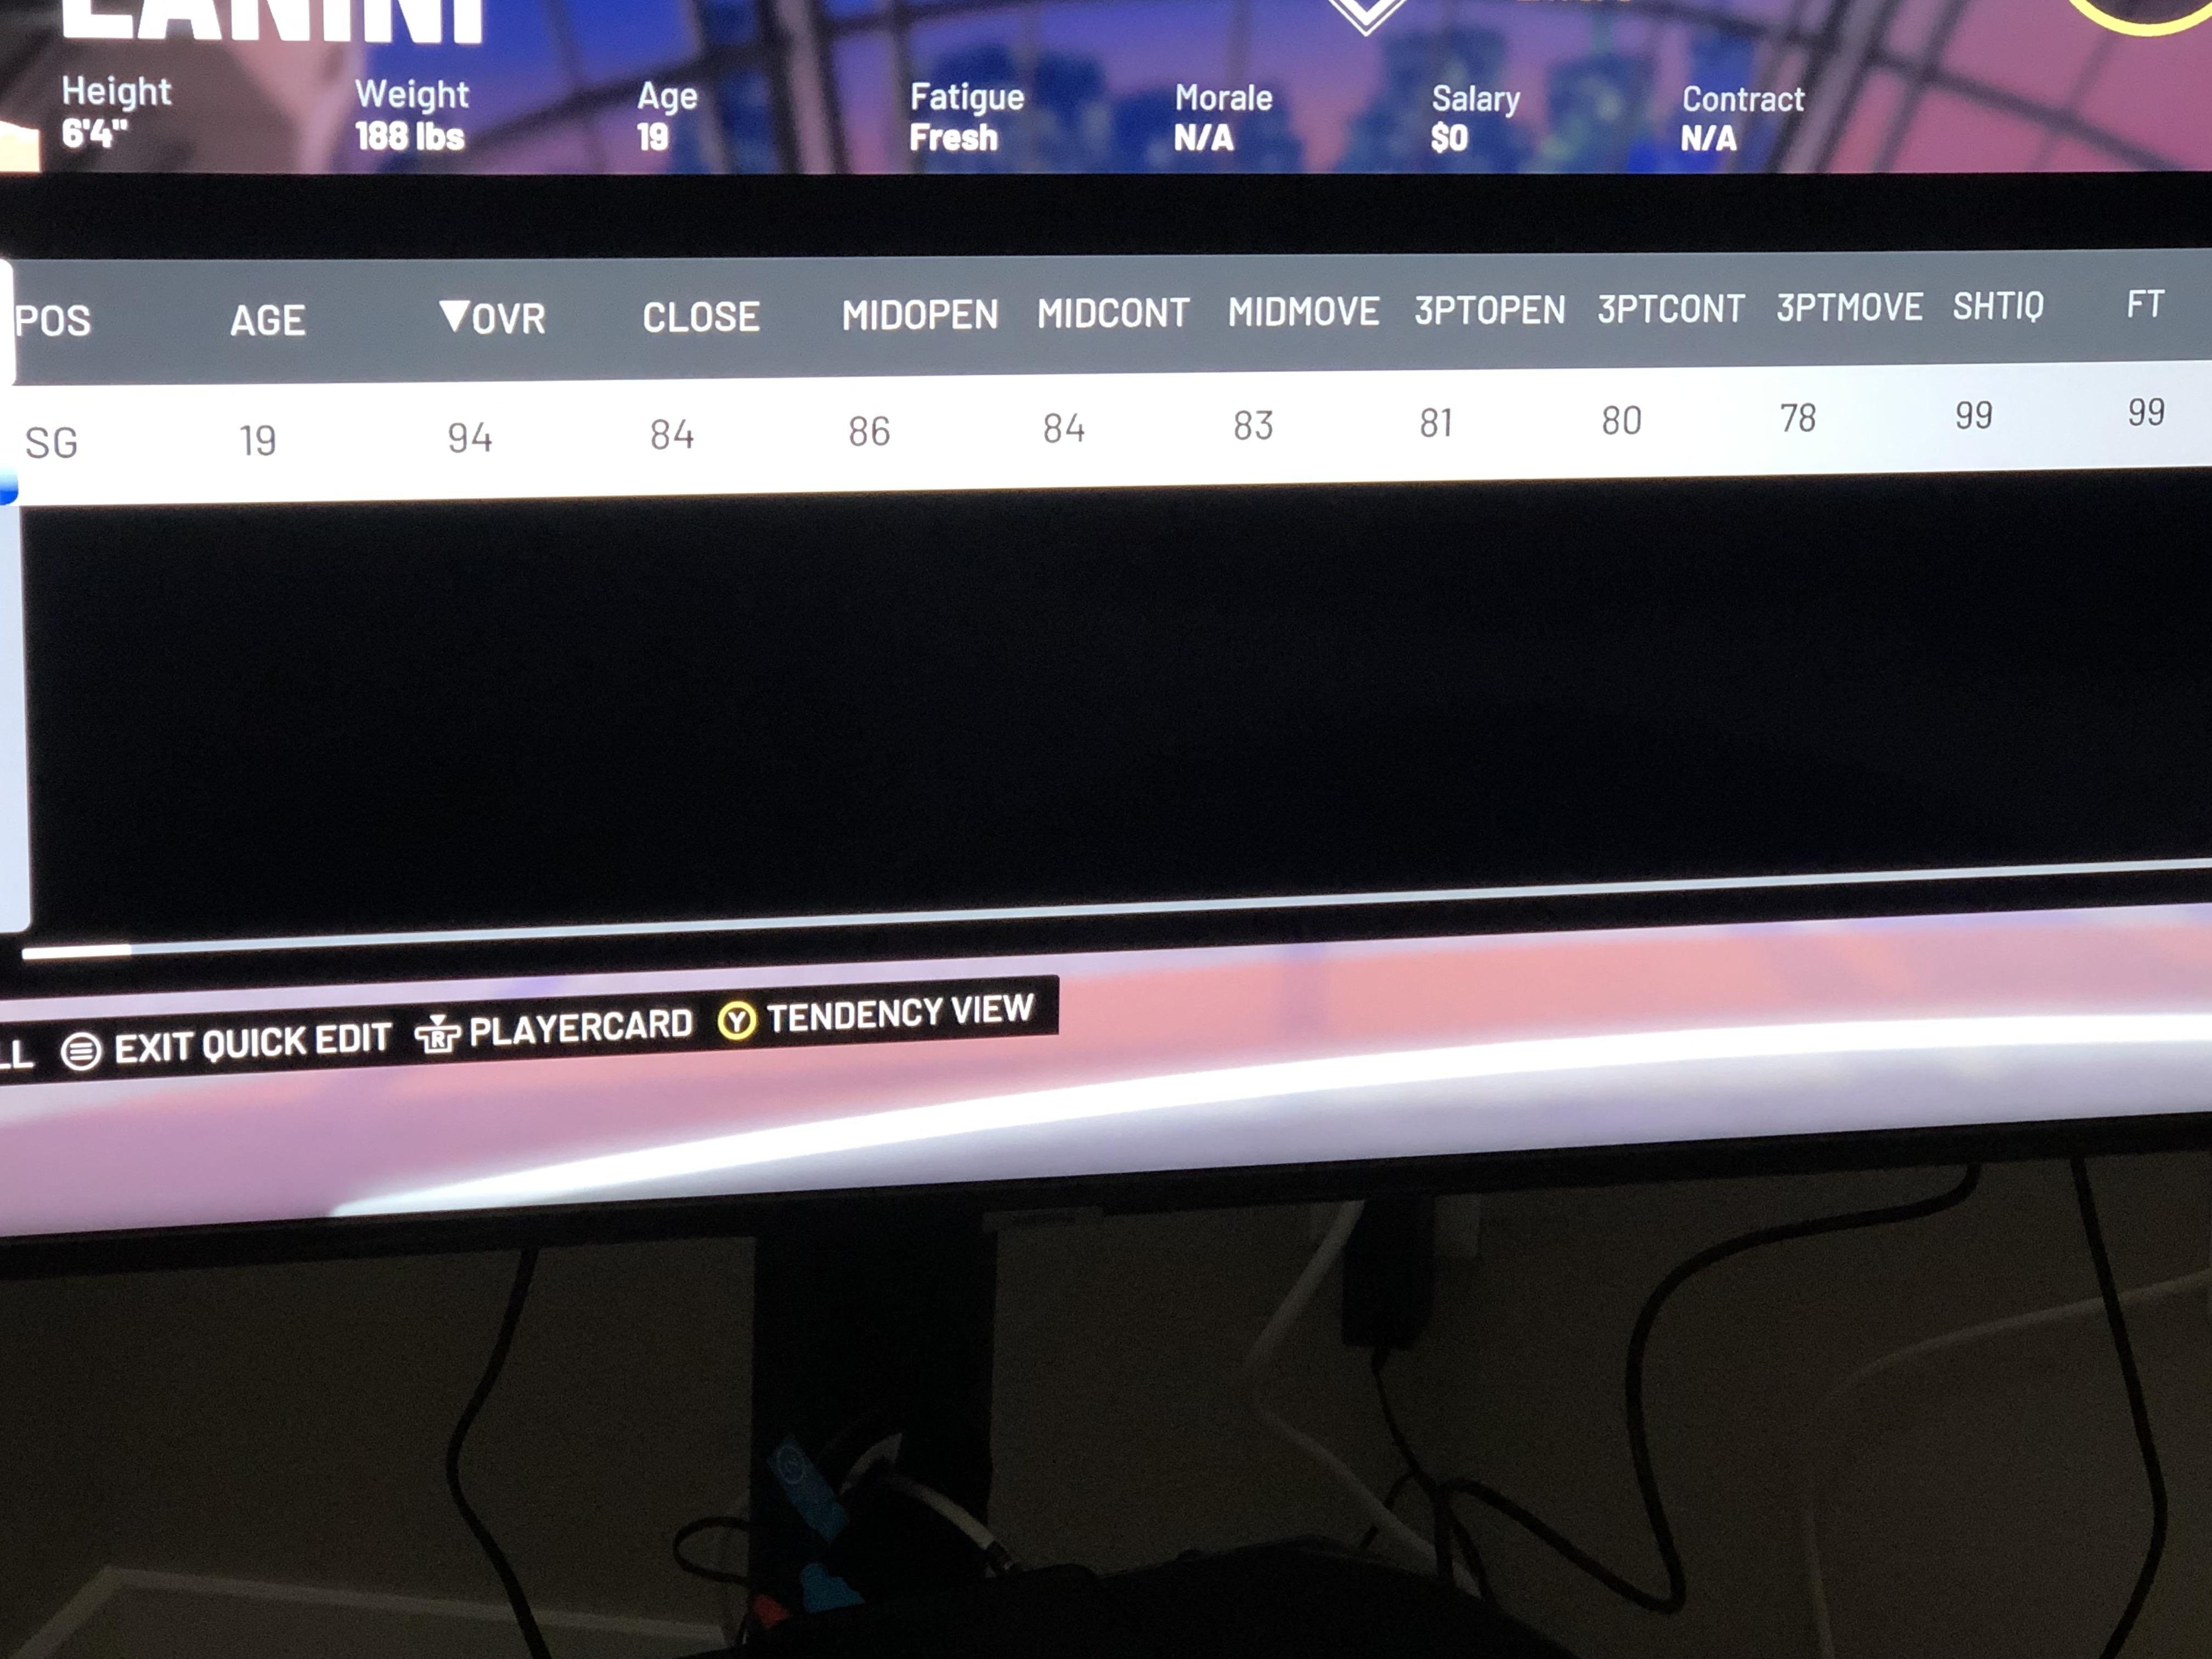 Nba 2K19 Badges Spreadsheet Pertaining To Nba 2K19 Cap Breaker Spreadsheet  Swfoodies